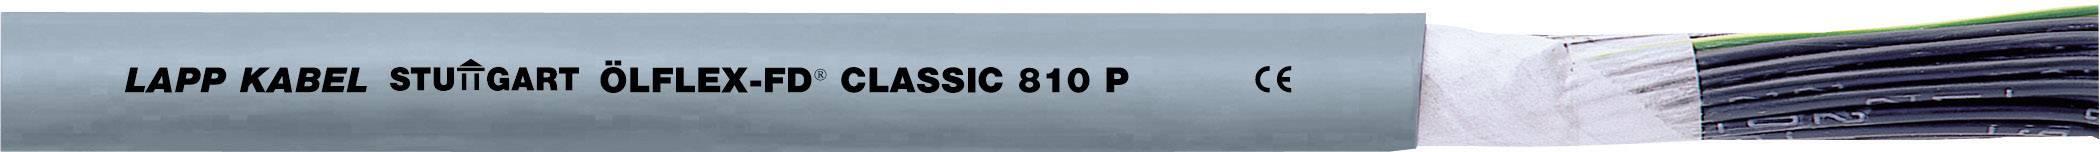 Tažný kabel LappKabel ÖLFLEX® FD CLASSIC 810 P 3G1,5 (0026350), 3x 1,5 mm², polyurethan, Ø 7,9 mm, nestíněný,